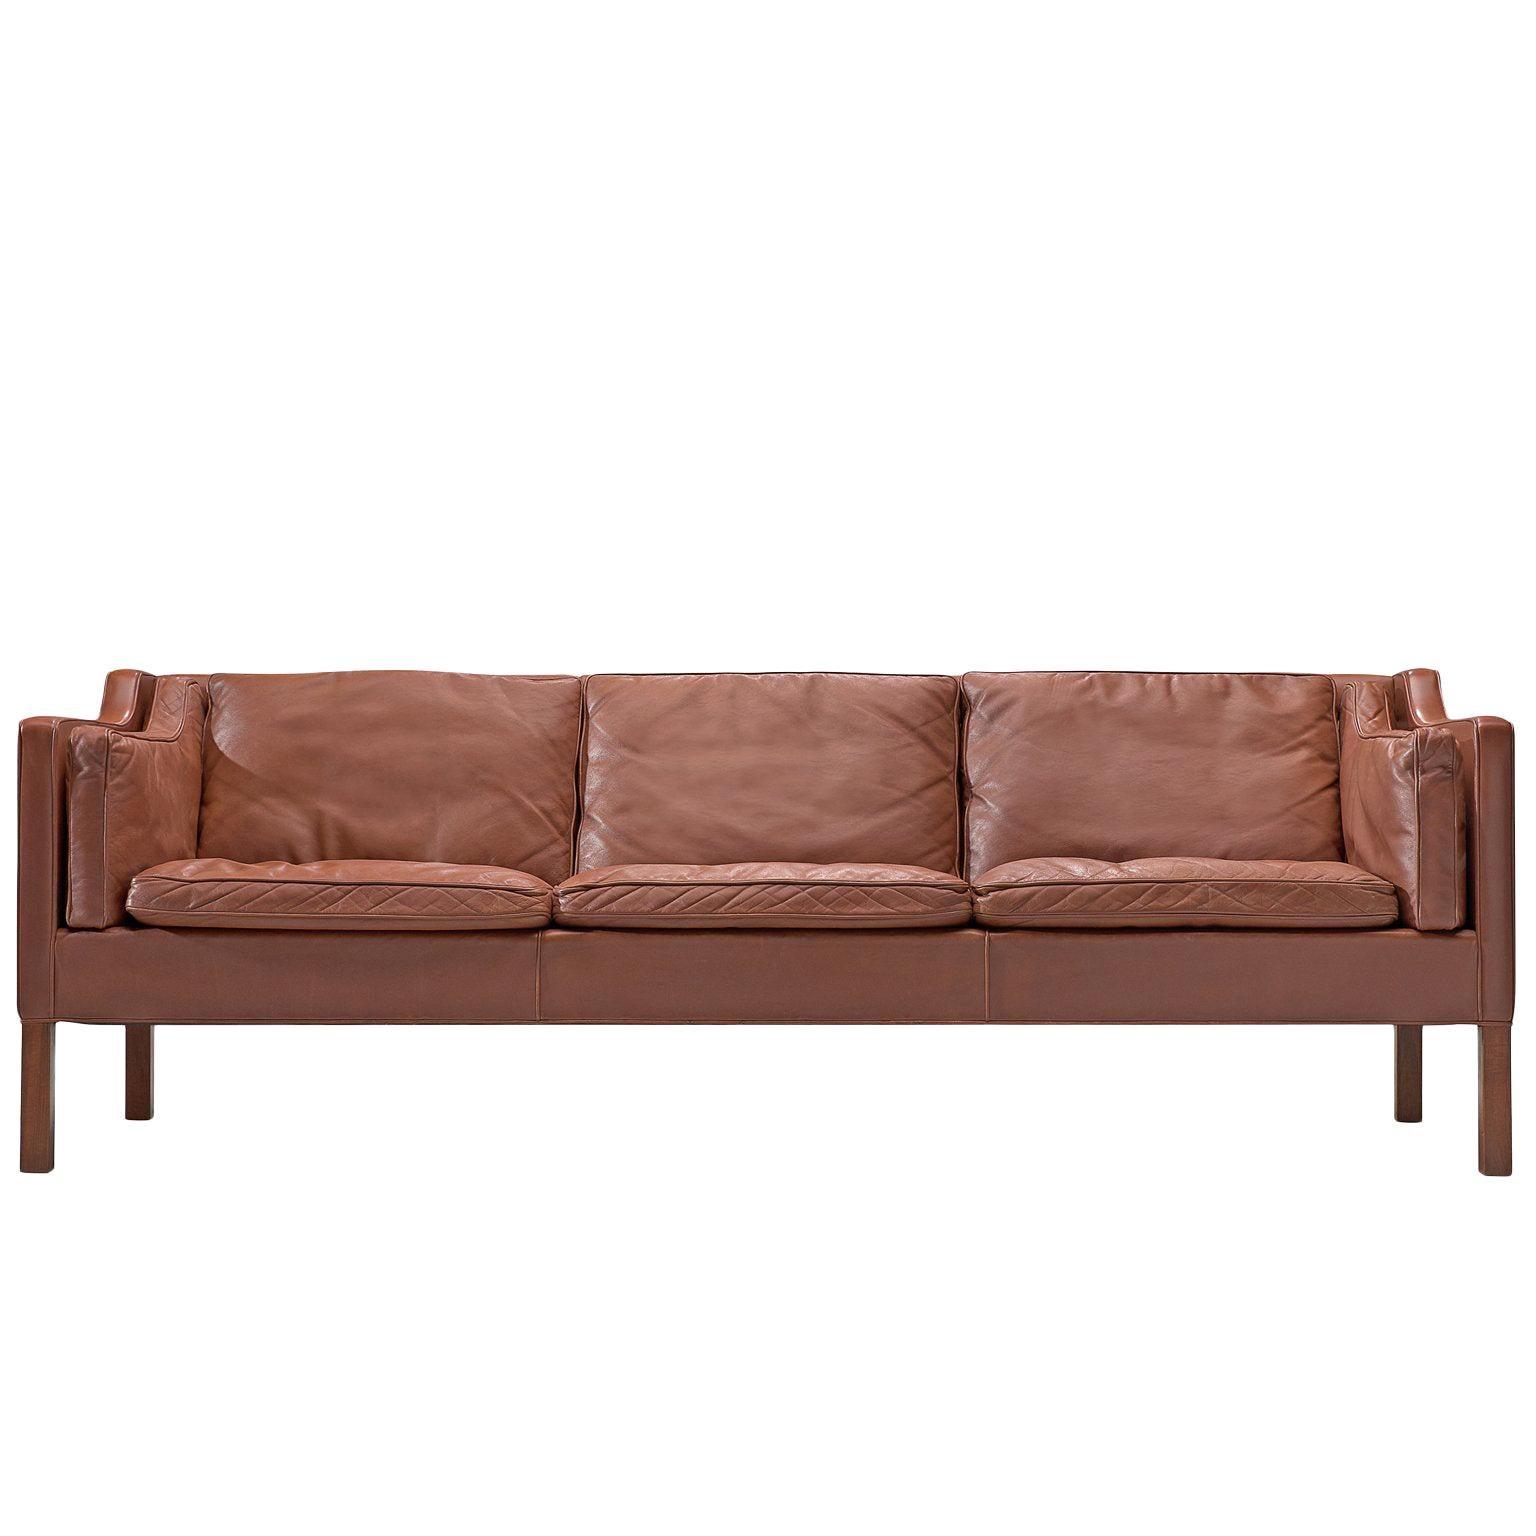 Børge Mogensen 2213 Sofa in Brown Leather